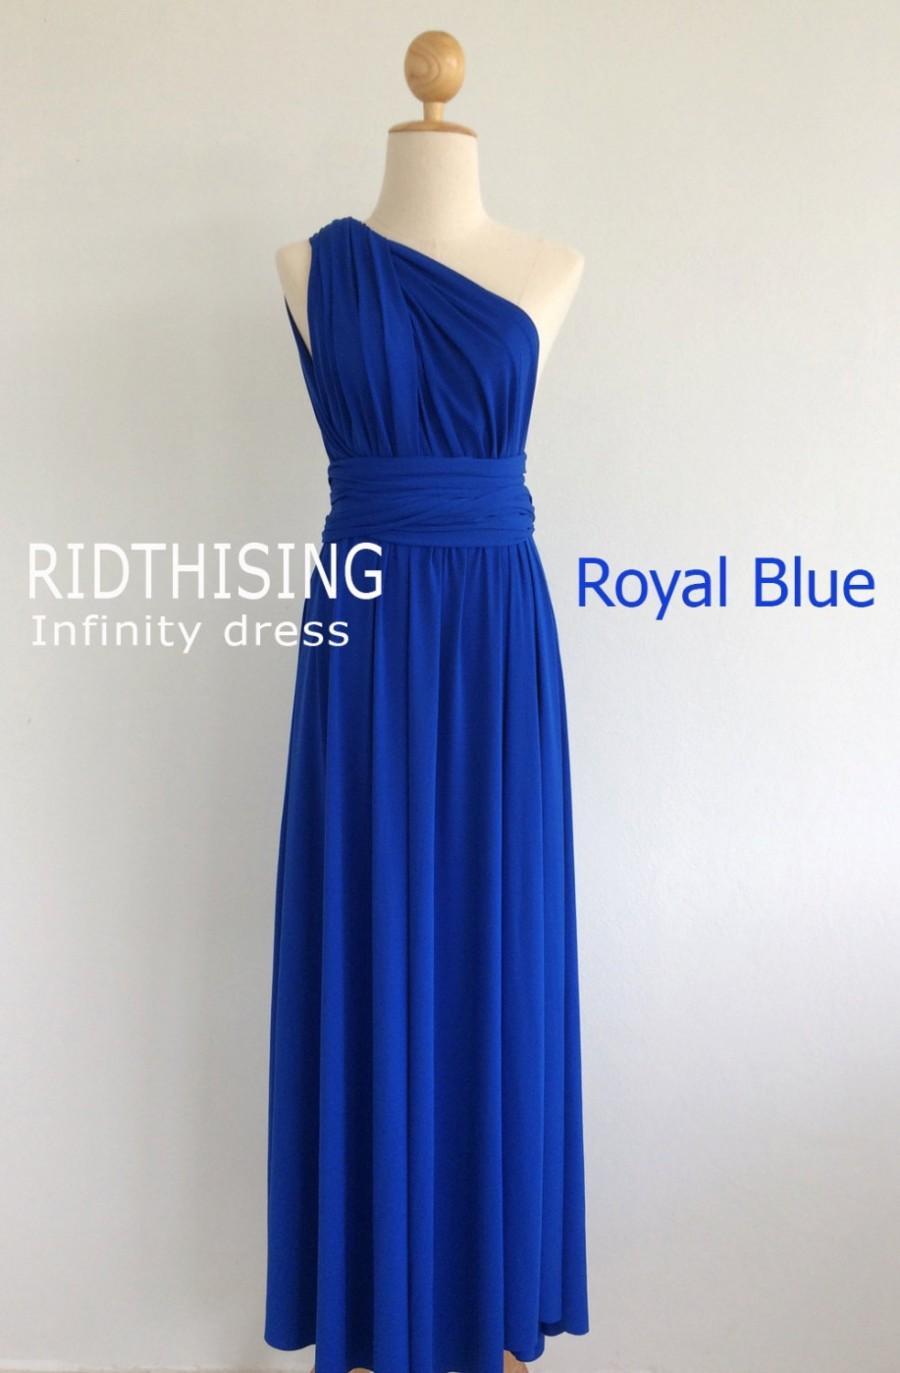 Wedding - Maxi Royal Blue Bridesmaid Dress infinity Dress Prom Dress Convertible Dress Wrap Dress